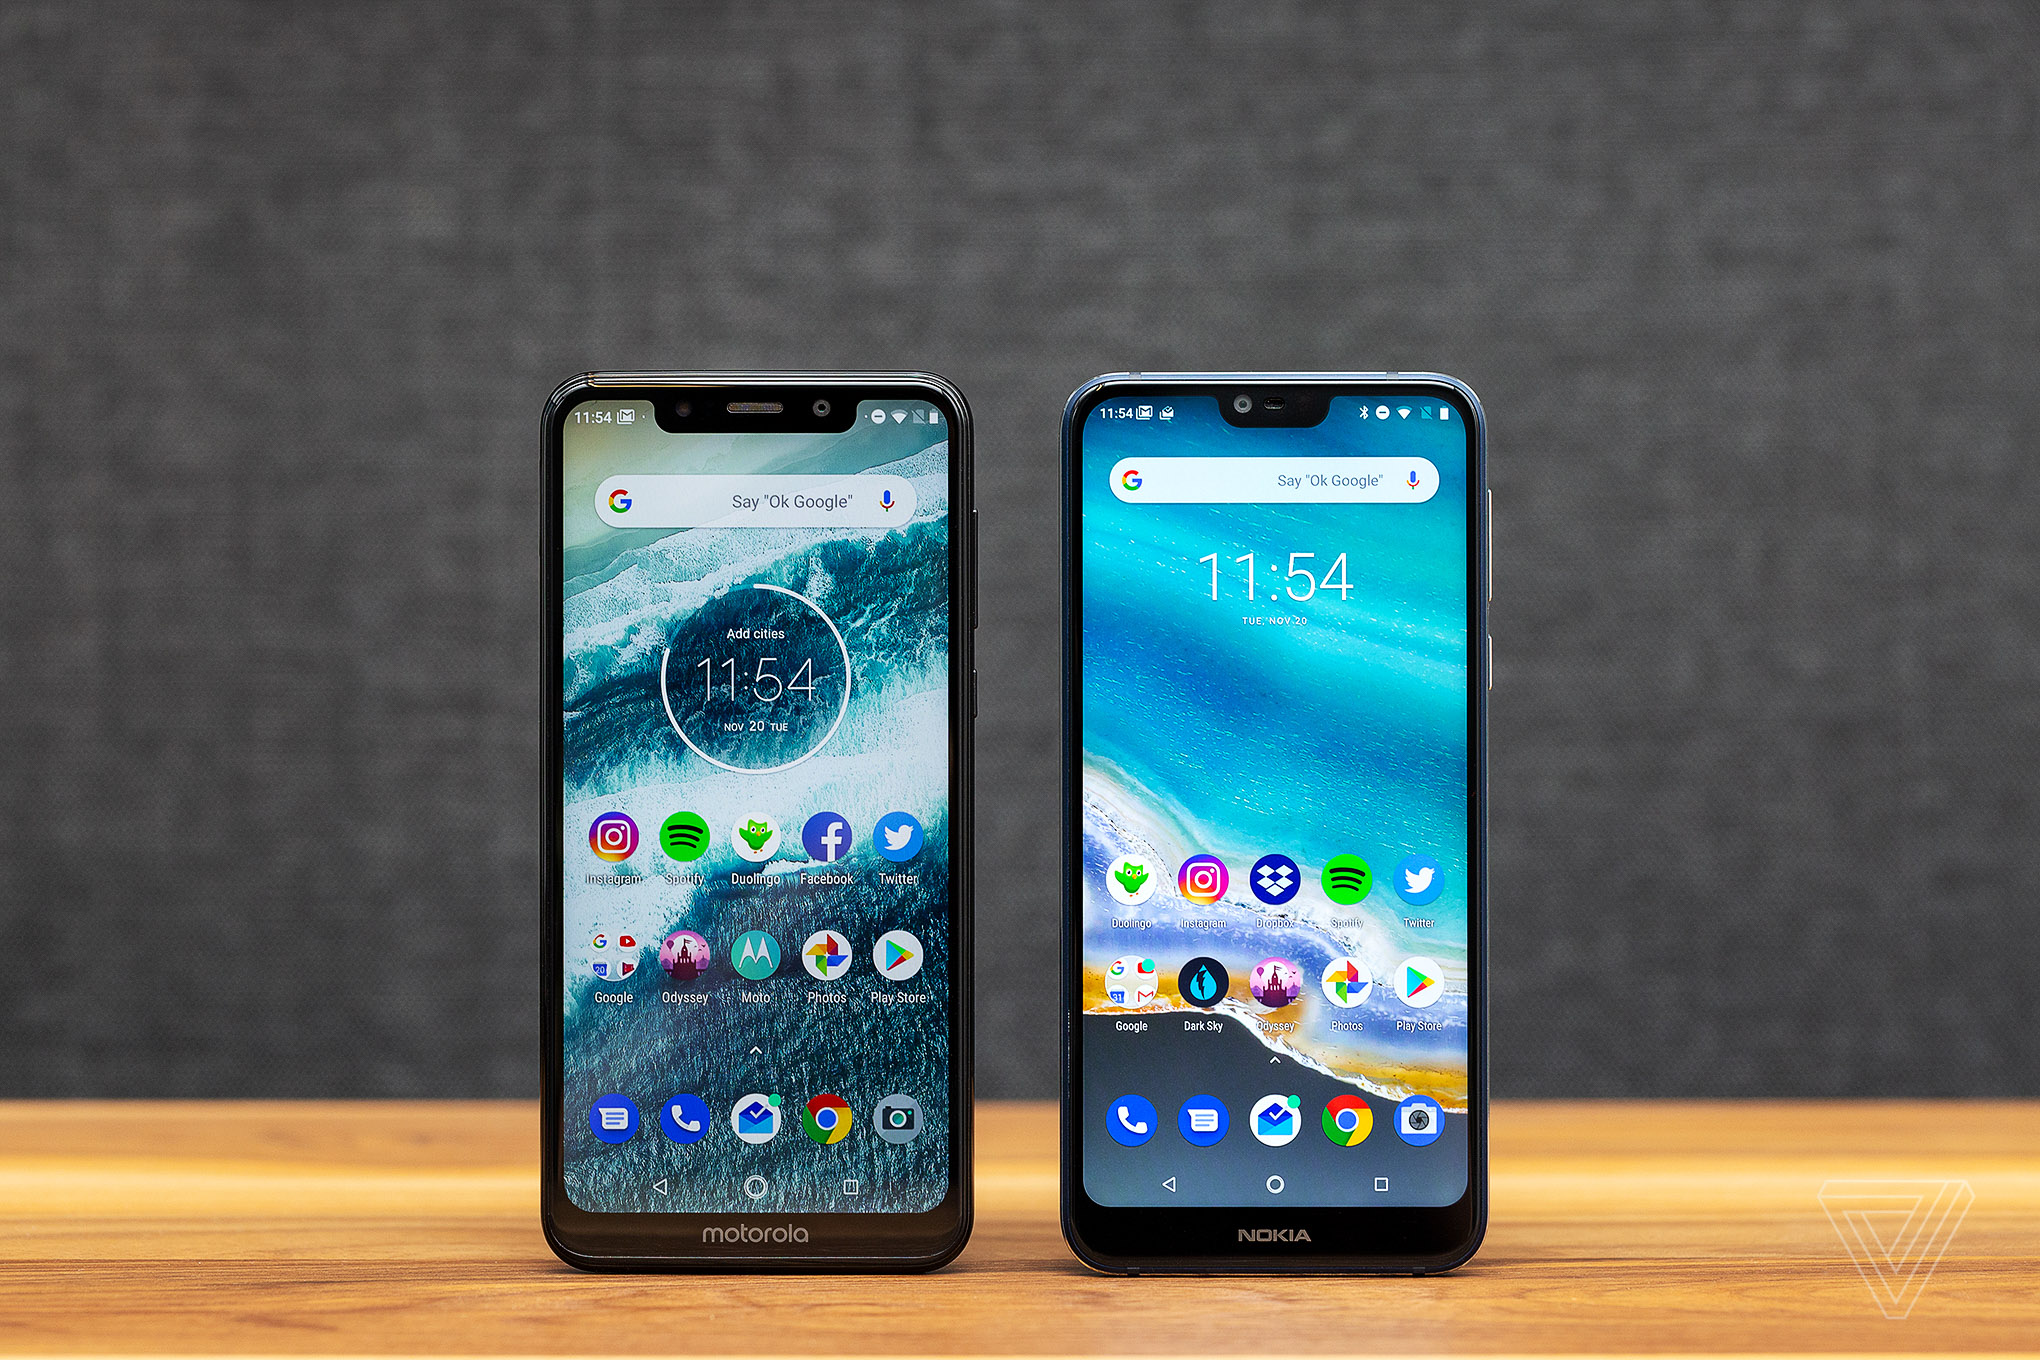 Motorola One and Nokia 7 1 review: small budget, big screens